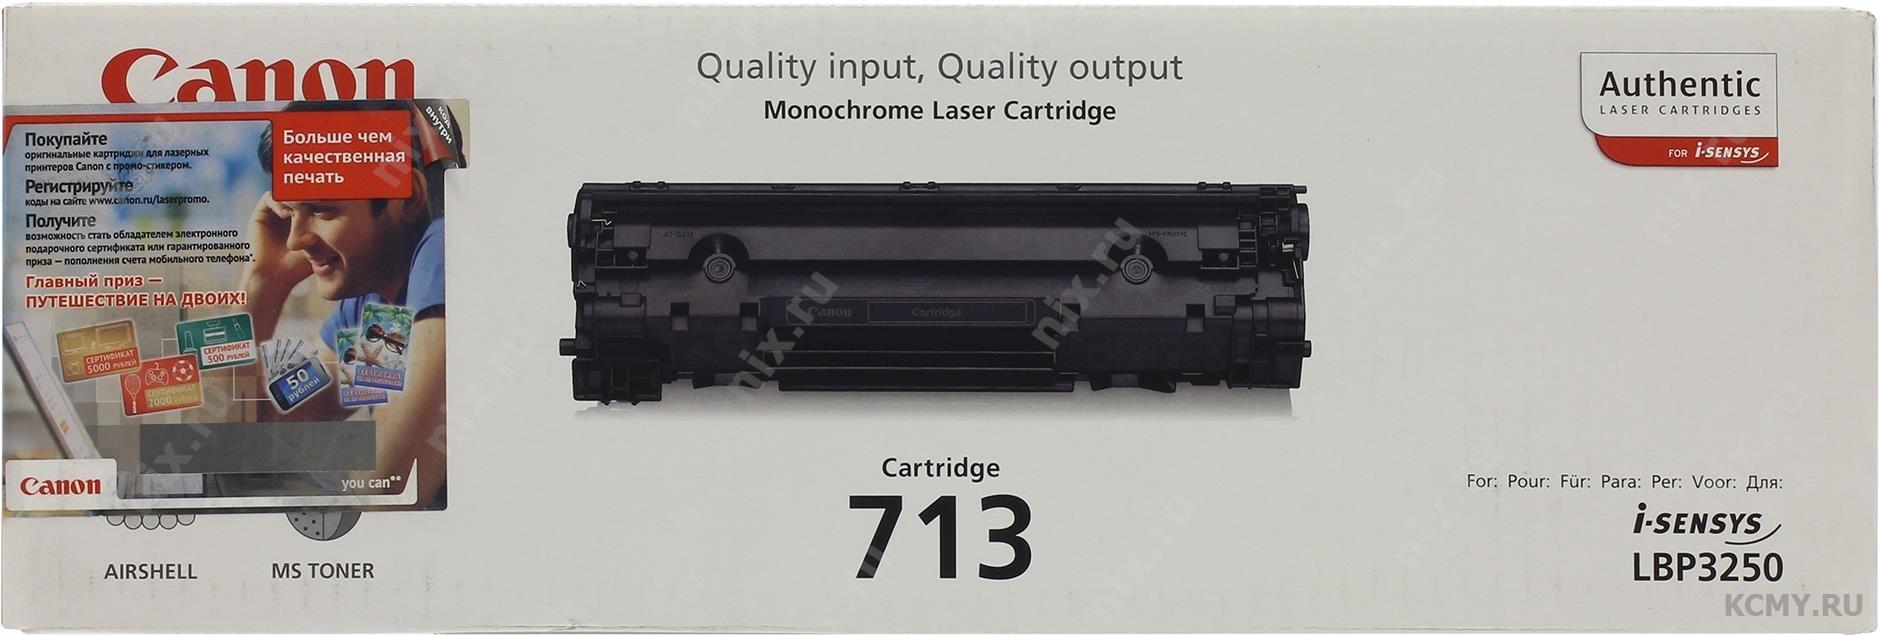 Canon Cartridge 713